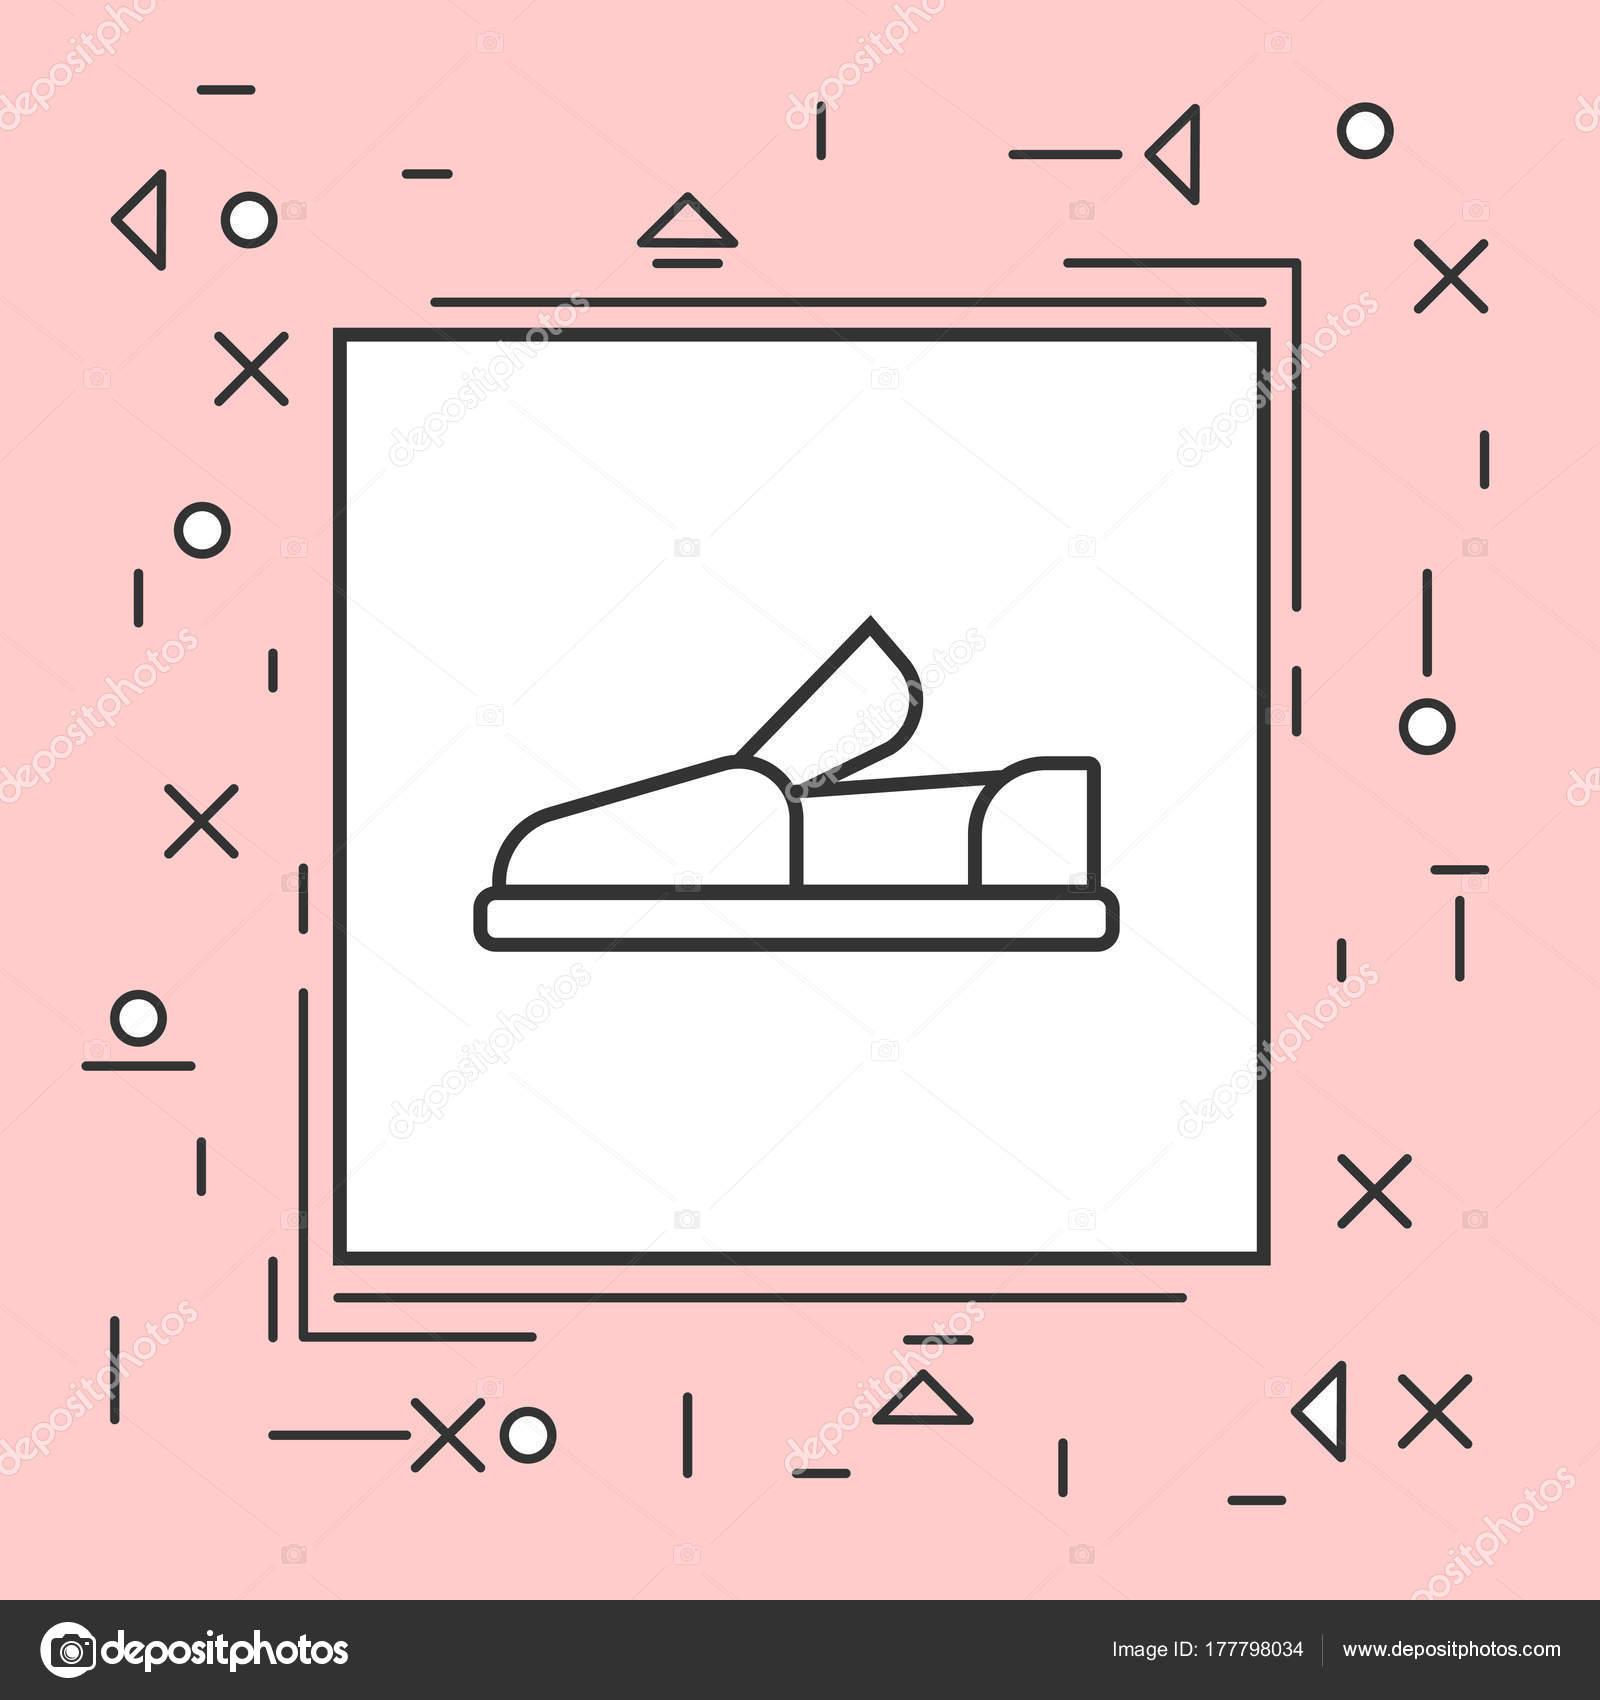 Mokassin Schuhe Symbol dünne Linie In Rosa Rahmen — Stockvektor ...